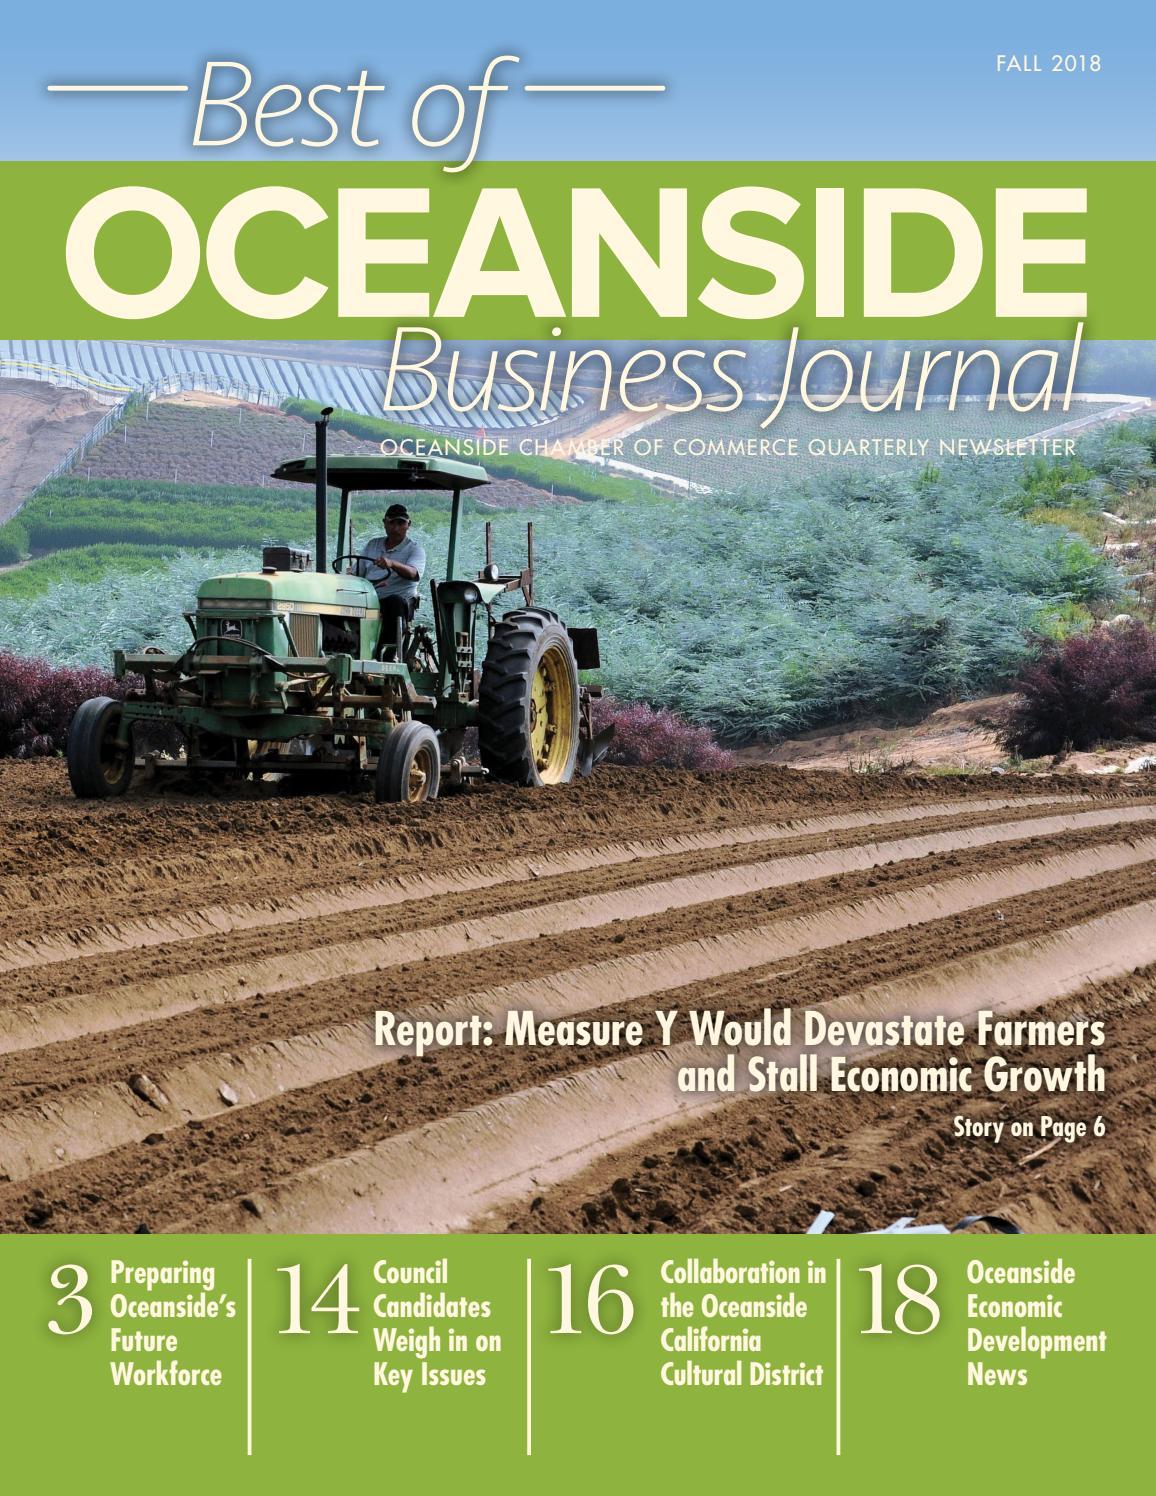 Best of OCEANSIDE Business Journal - FALL 2018 by Oceanside